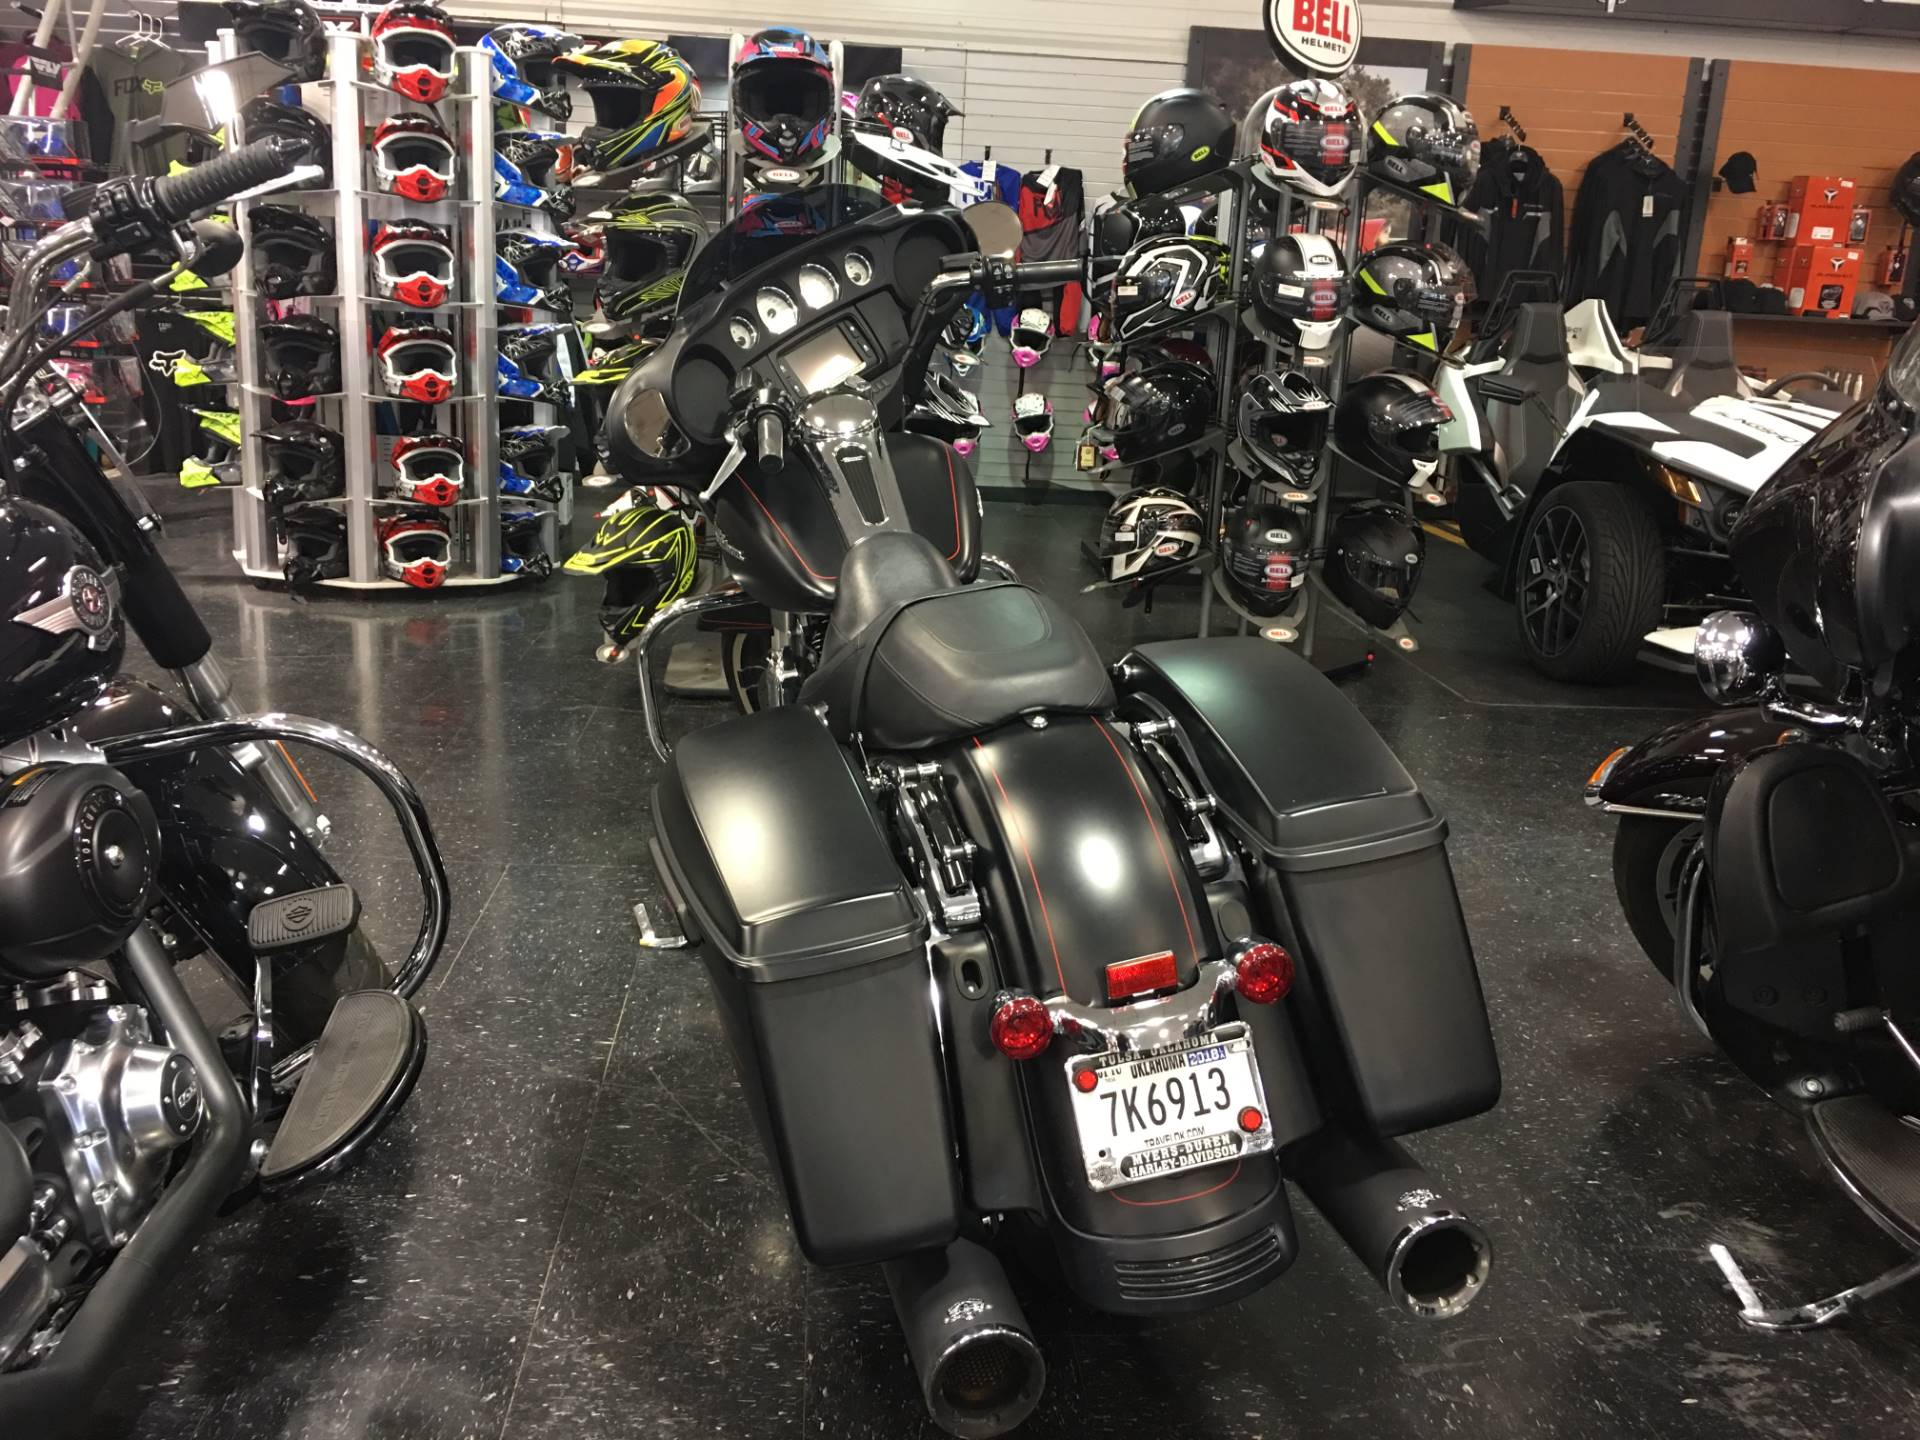 2015 Harley-Davidson Street Glide Special 3